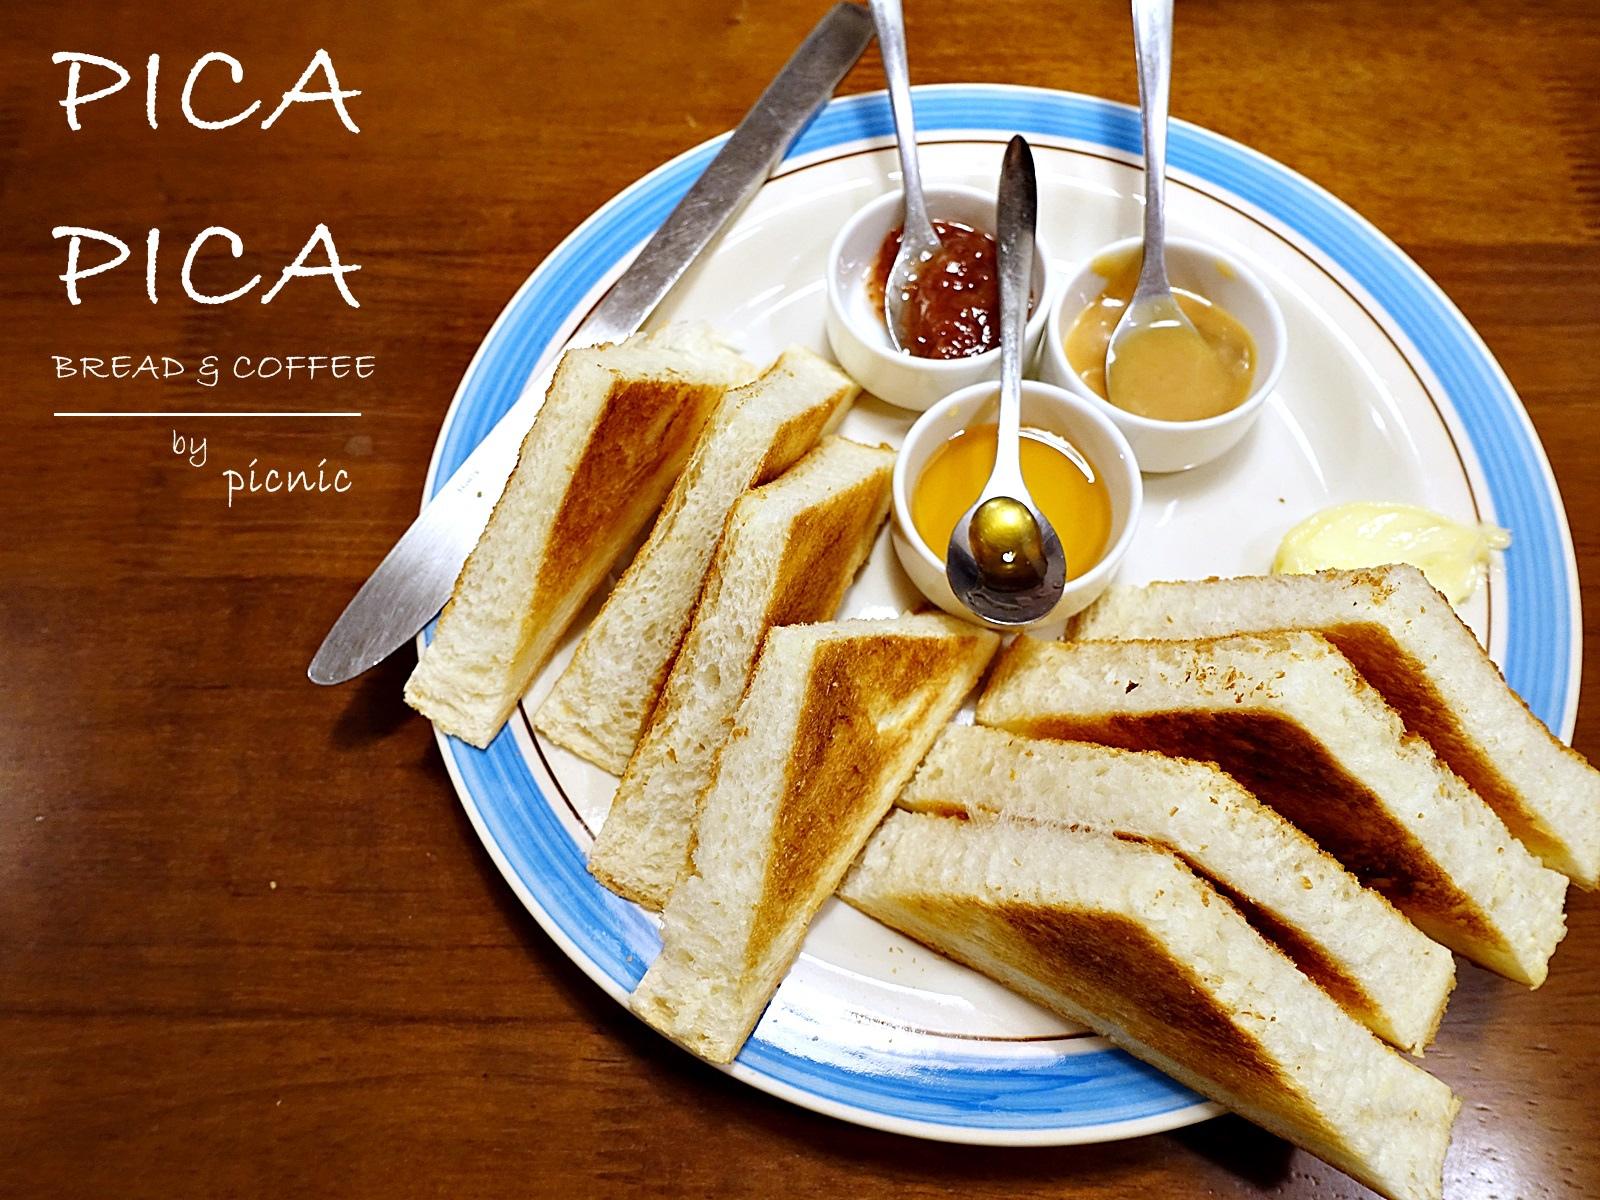 picapica-0